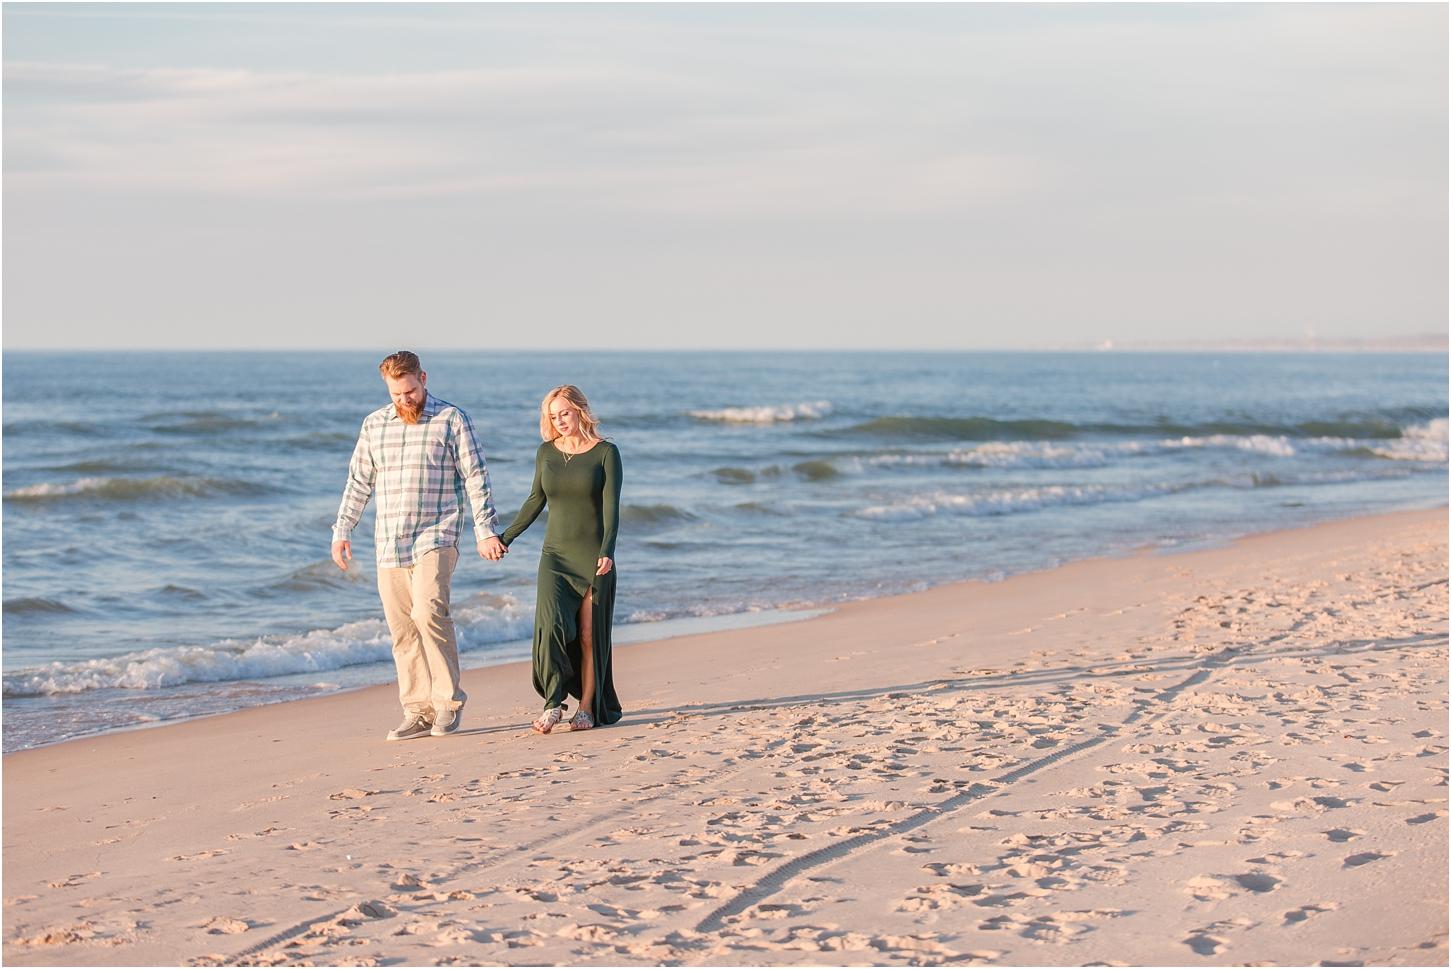 romantic-sunset-beach-engagement-photos-at-silver-beach-in-saint-joseph-mi-by-courtney-carolyn-photography_0034.jpg